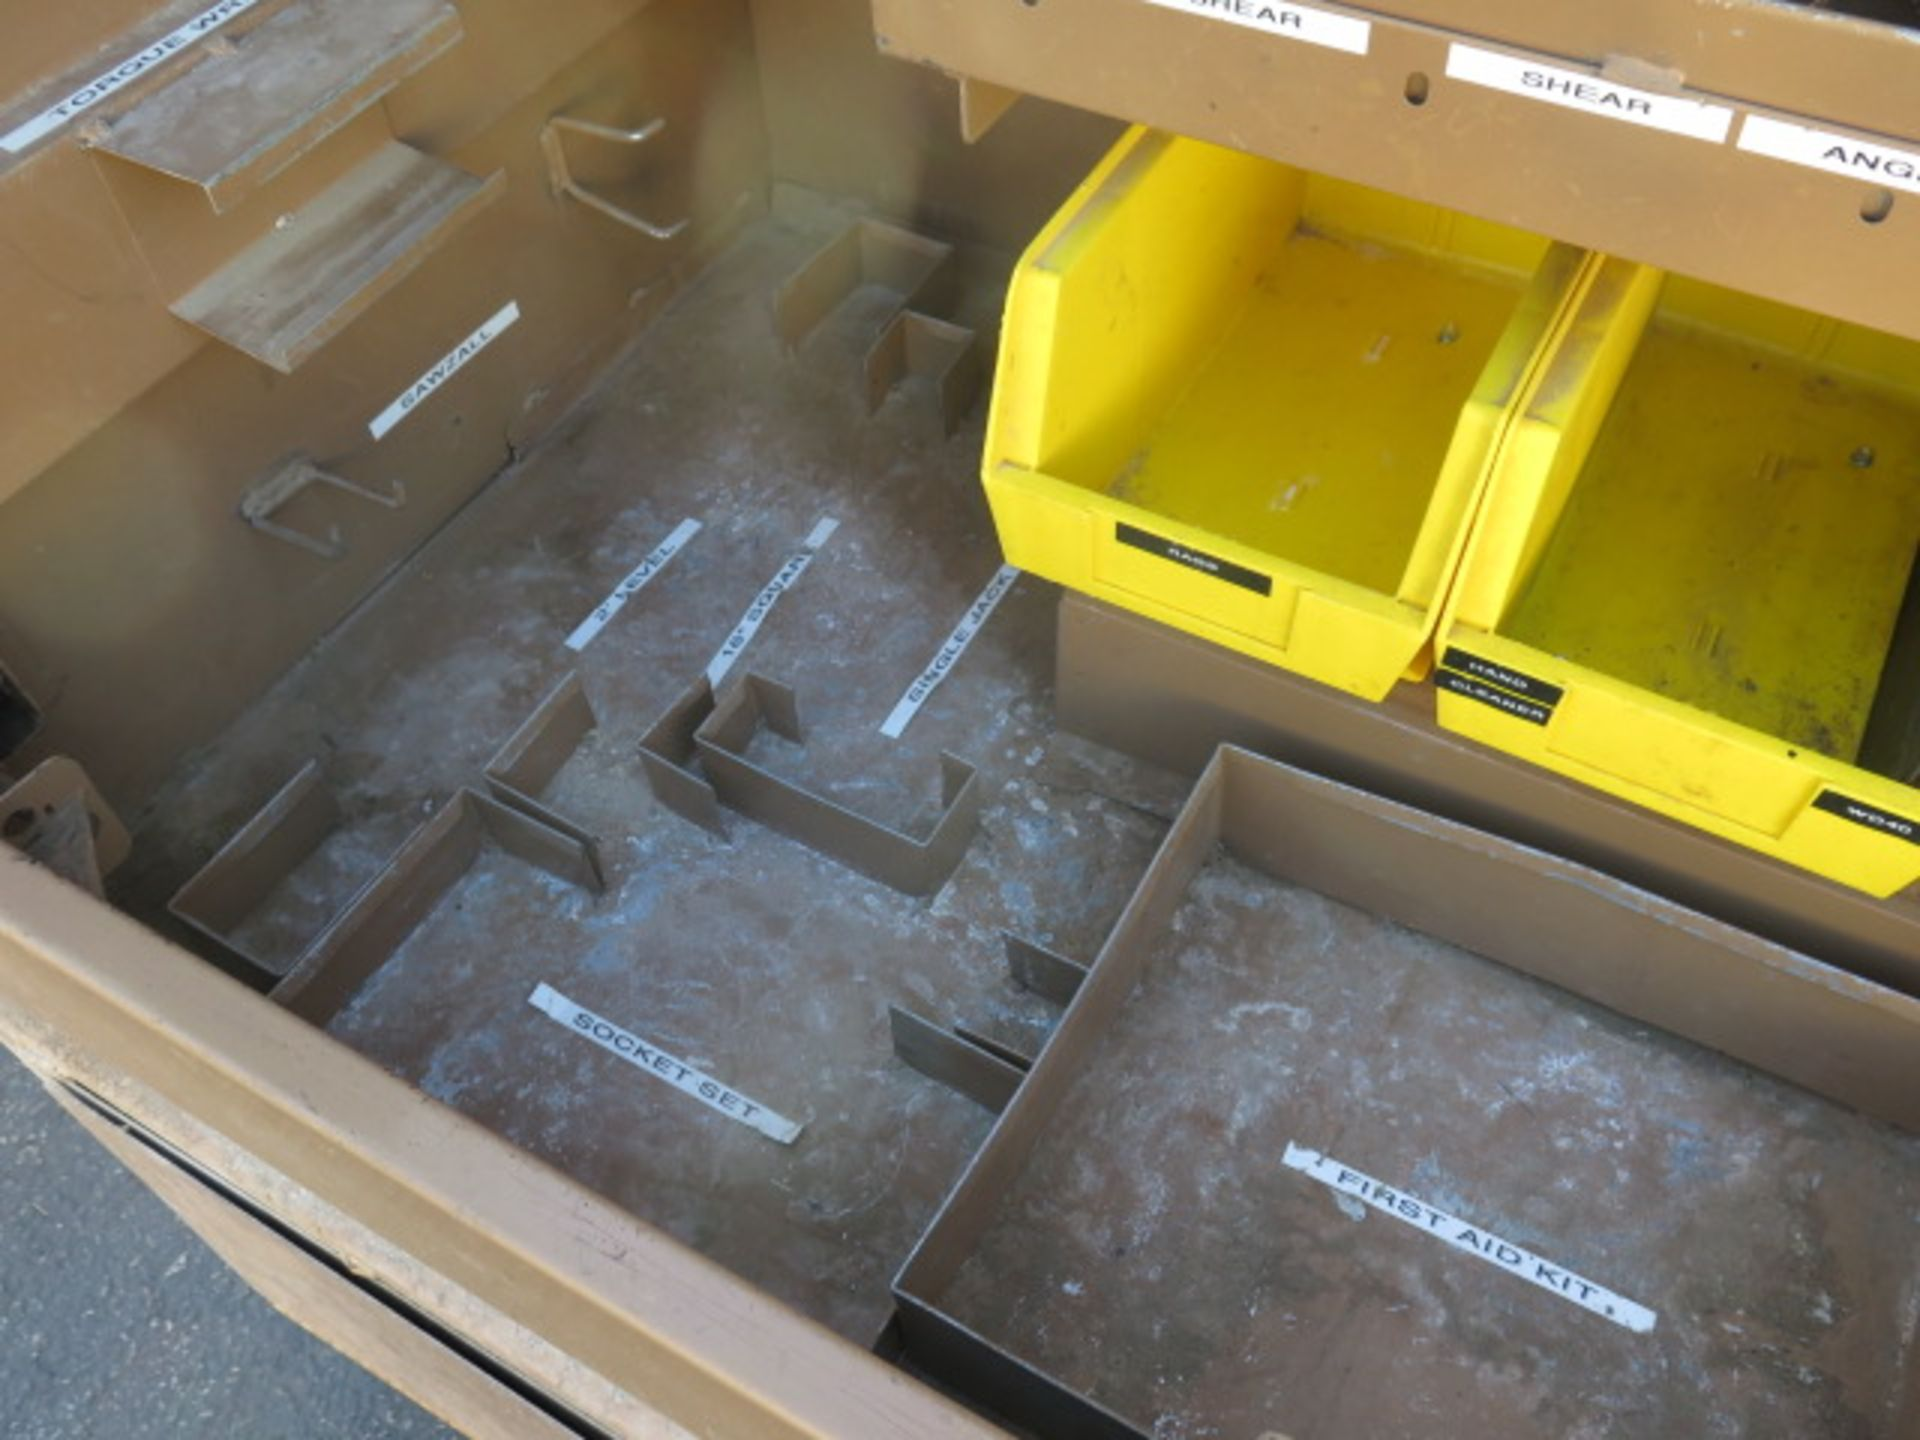 Knaack mdl. 89 Storagemaster Rolling Job Box (SOLD AS-IS - NO WARRANTY) - Image 7 of 12